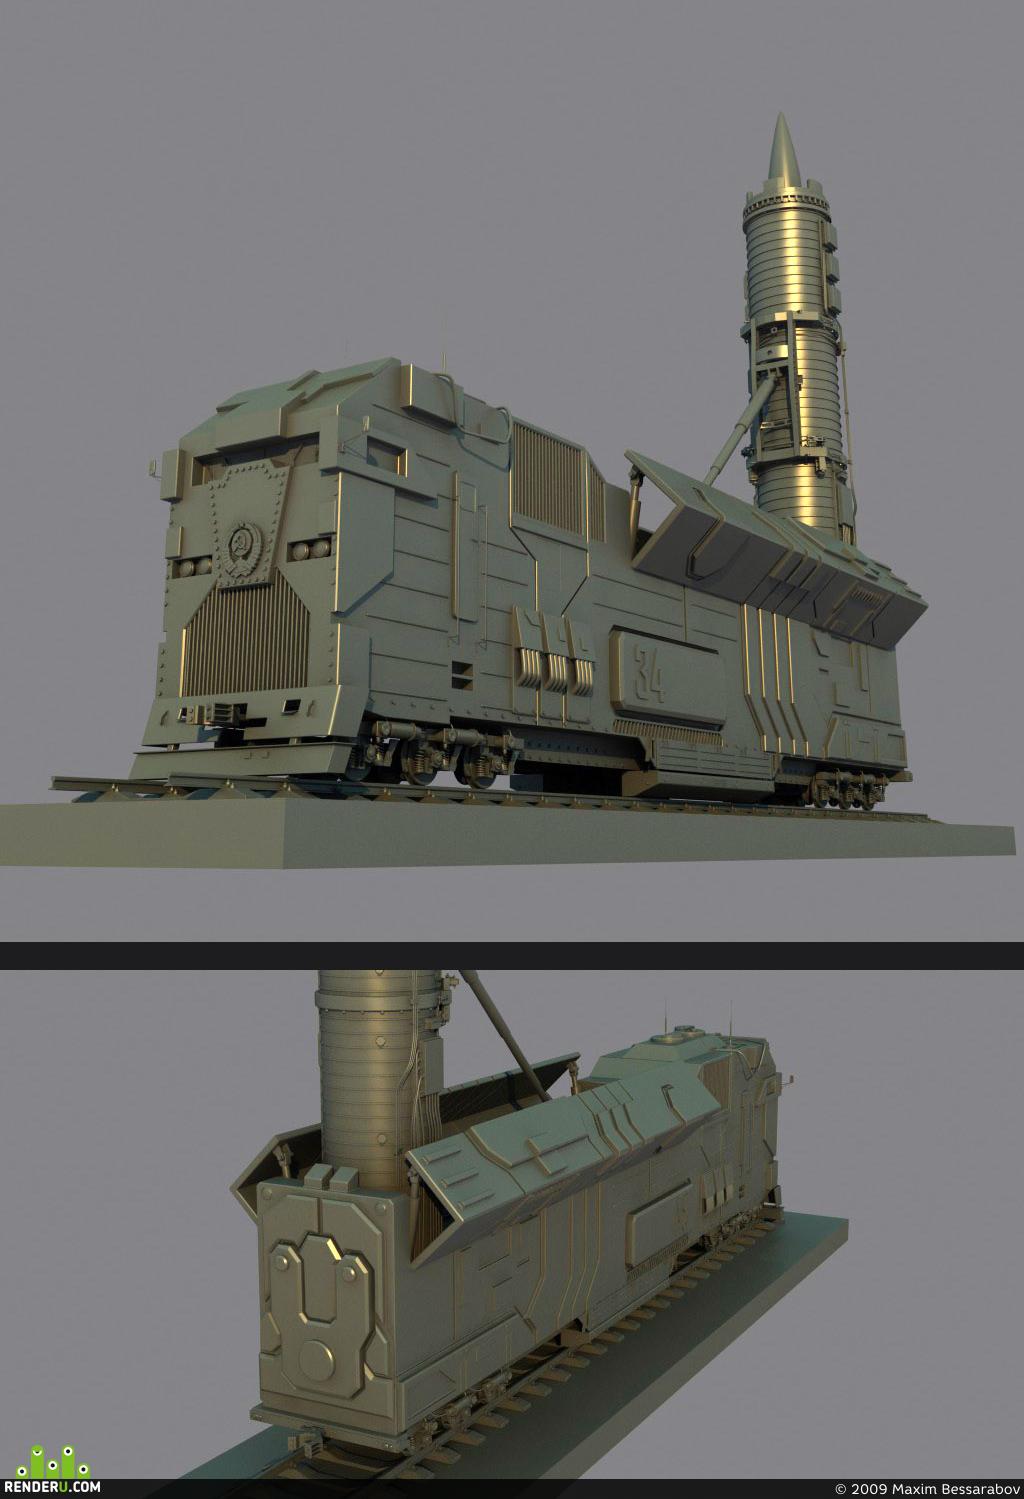 preview SMERCOZZ train